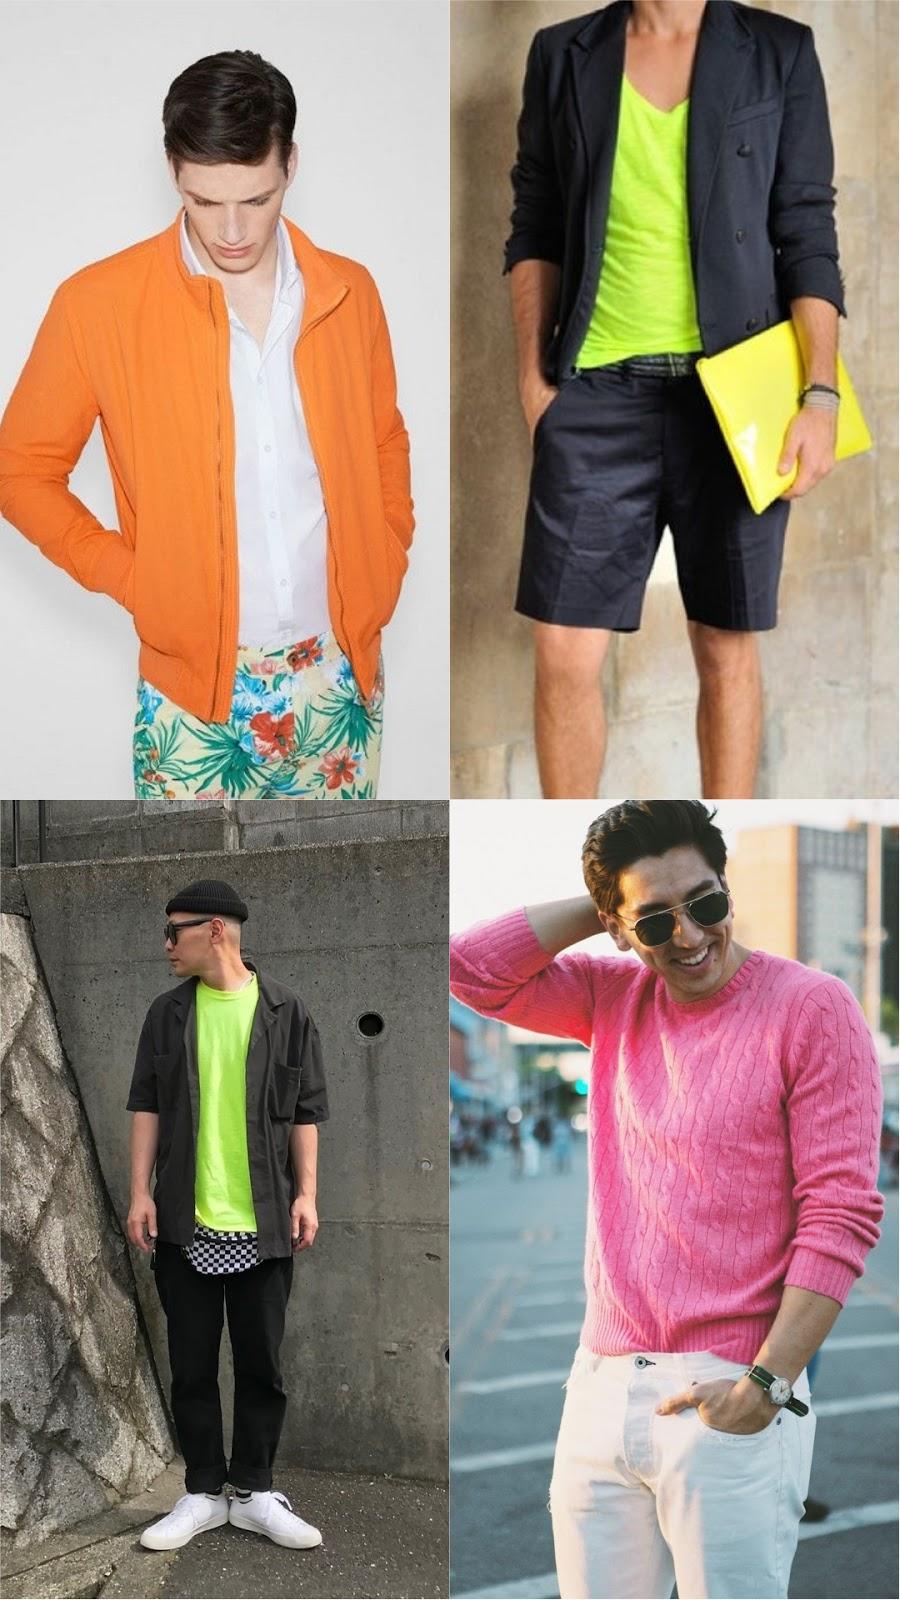 tendencias-moda-masculina-primavera-verao-2019-blog-tres-chic-look-neon-florescente